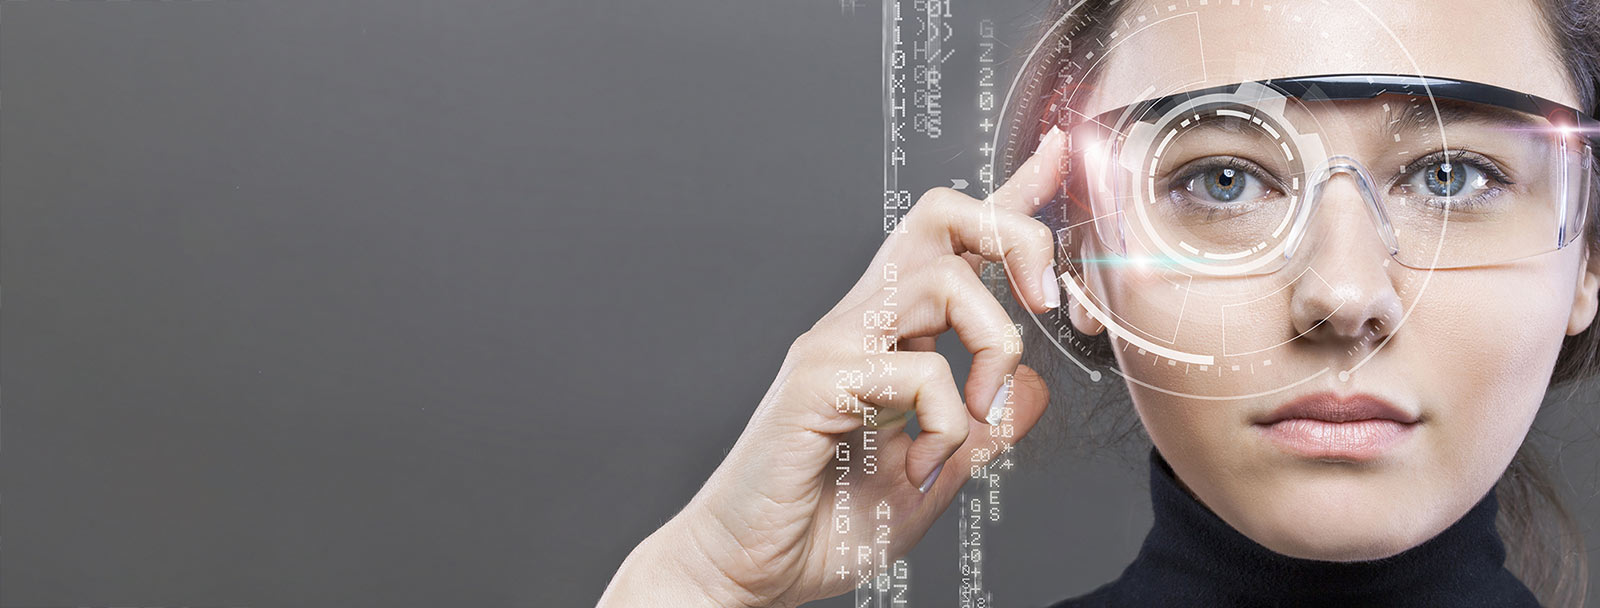 Phygital è futuro